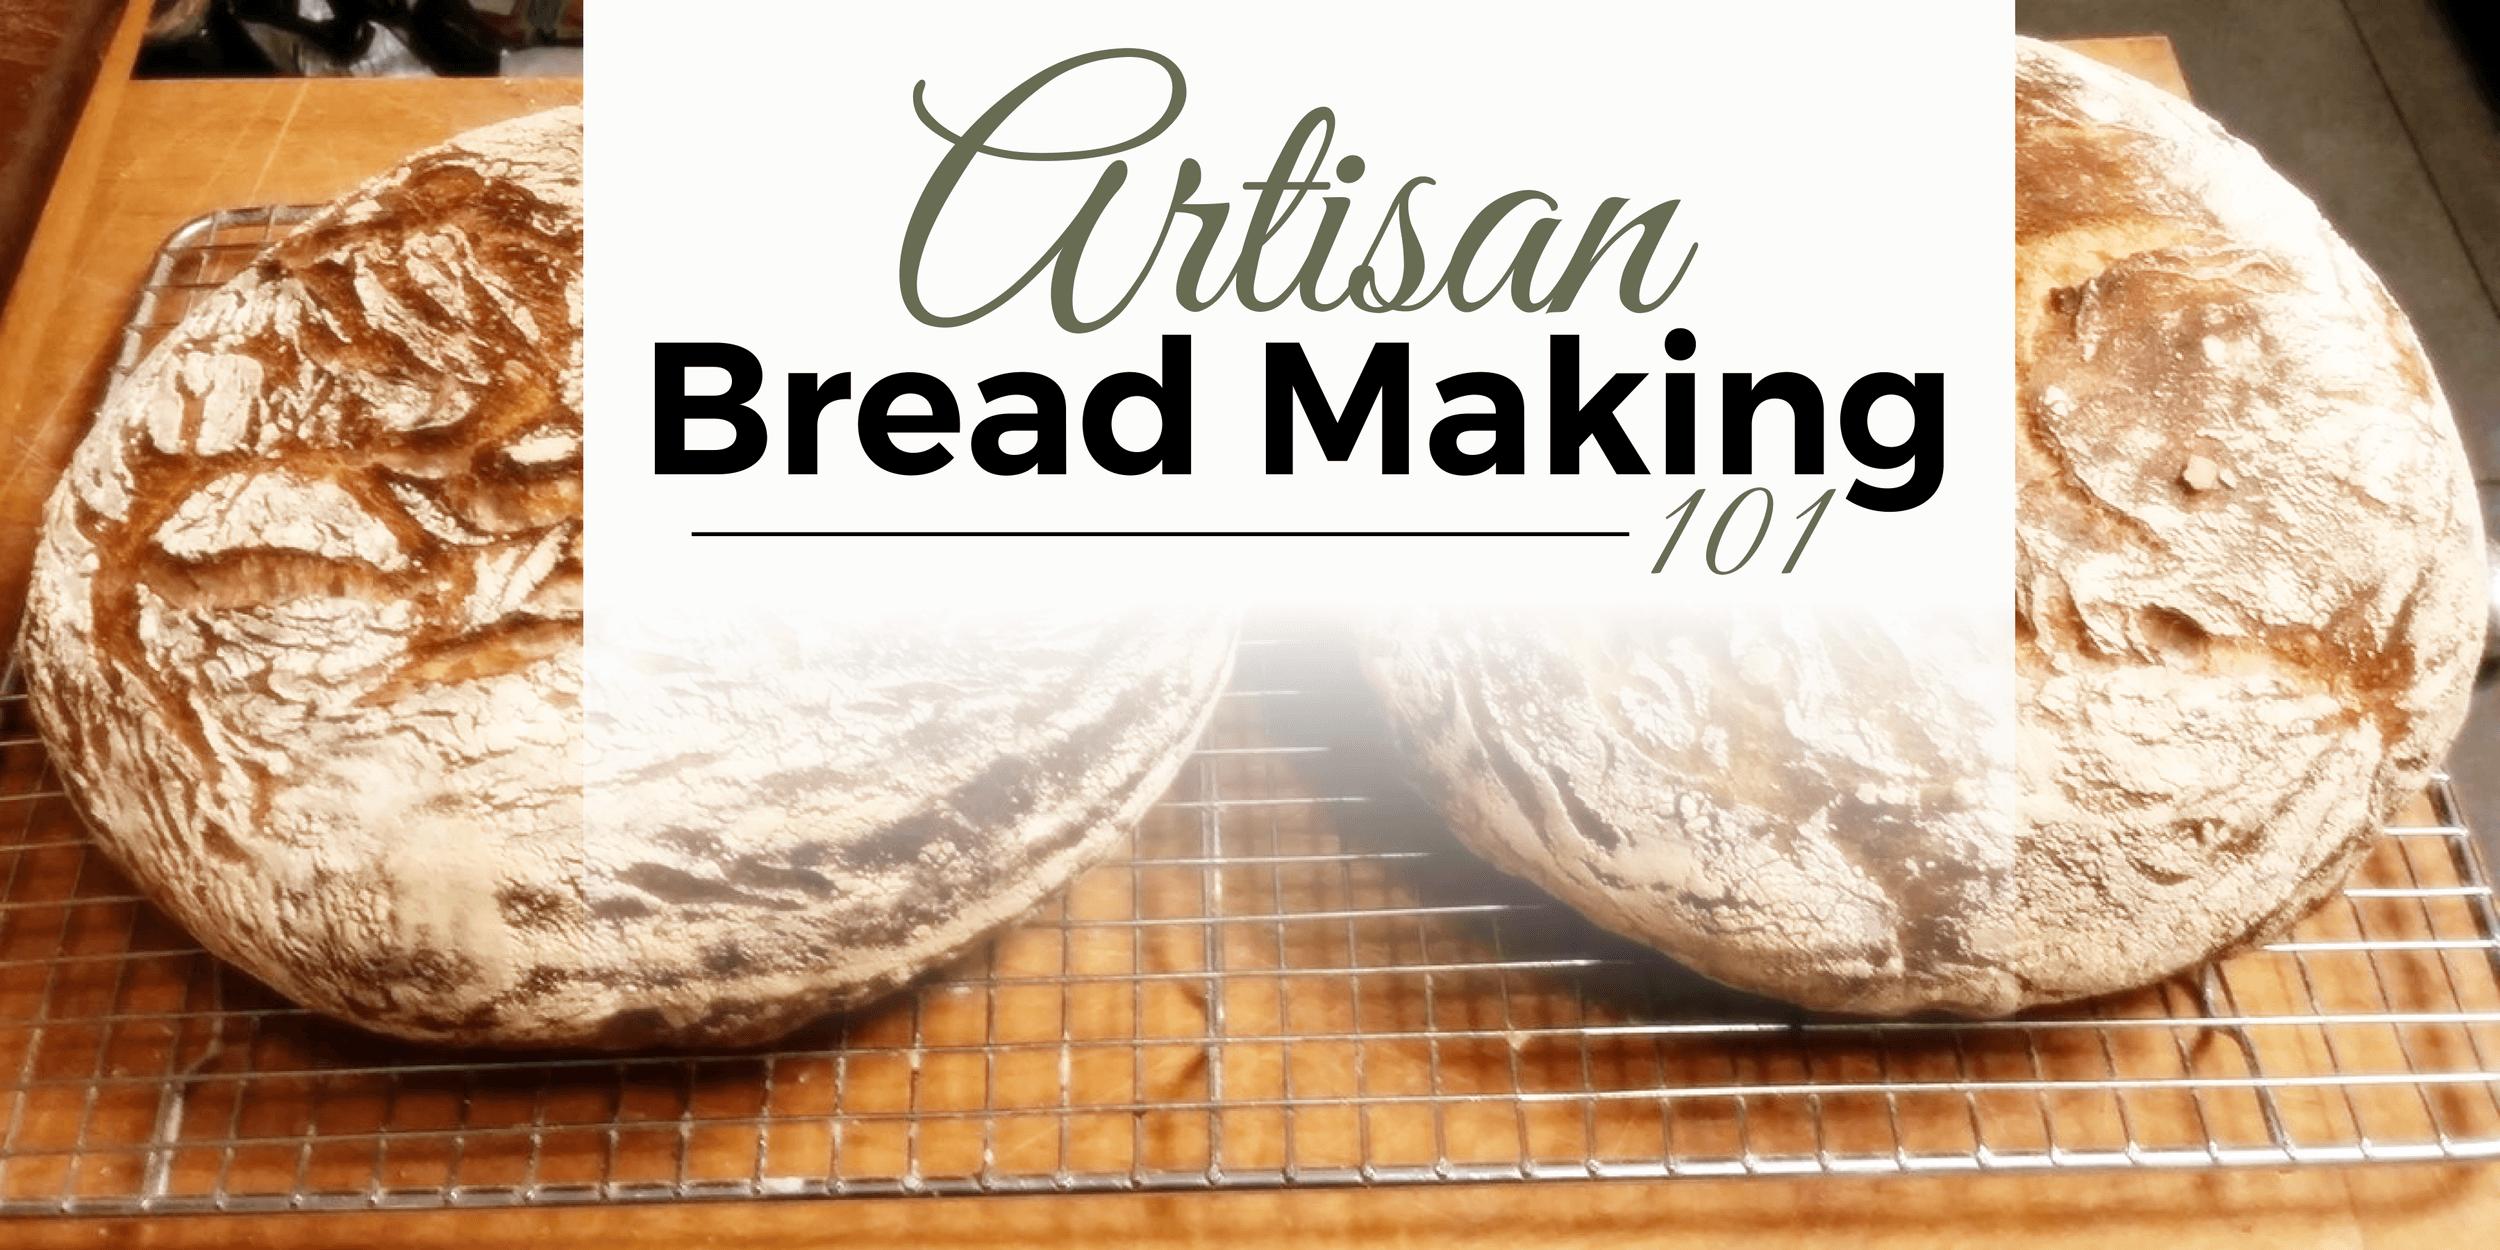 Artisan Bread Making 101 Class | Owenhouse Ace Hardware